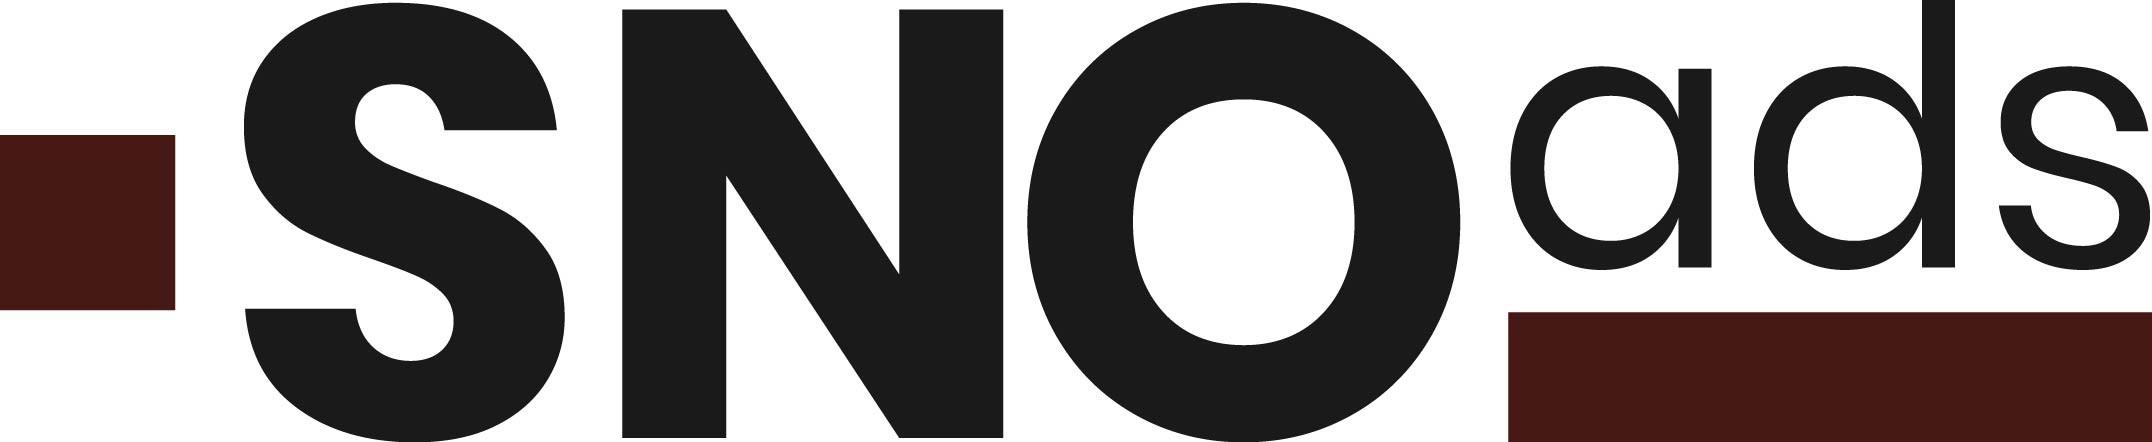 Design a creative logo for a new online advertising platform